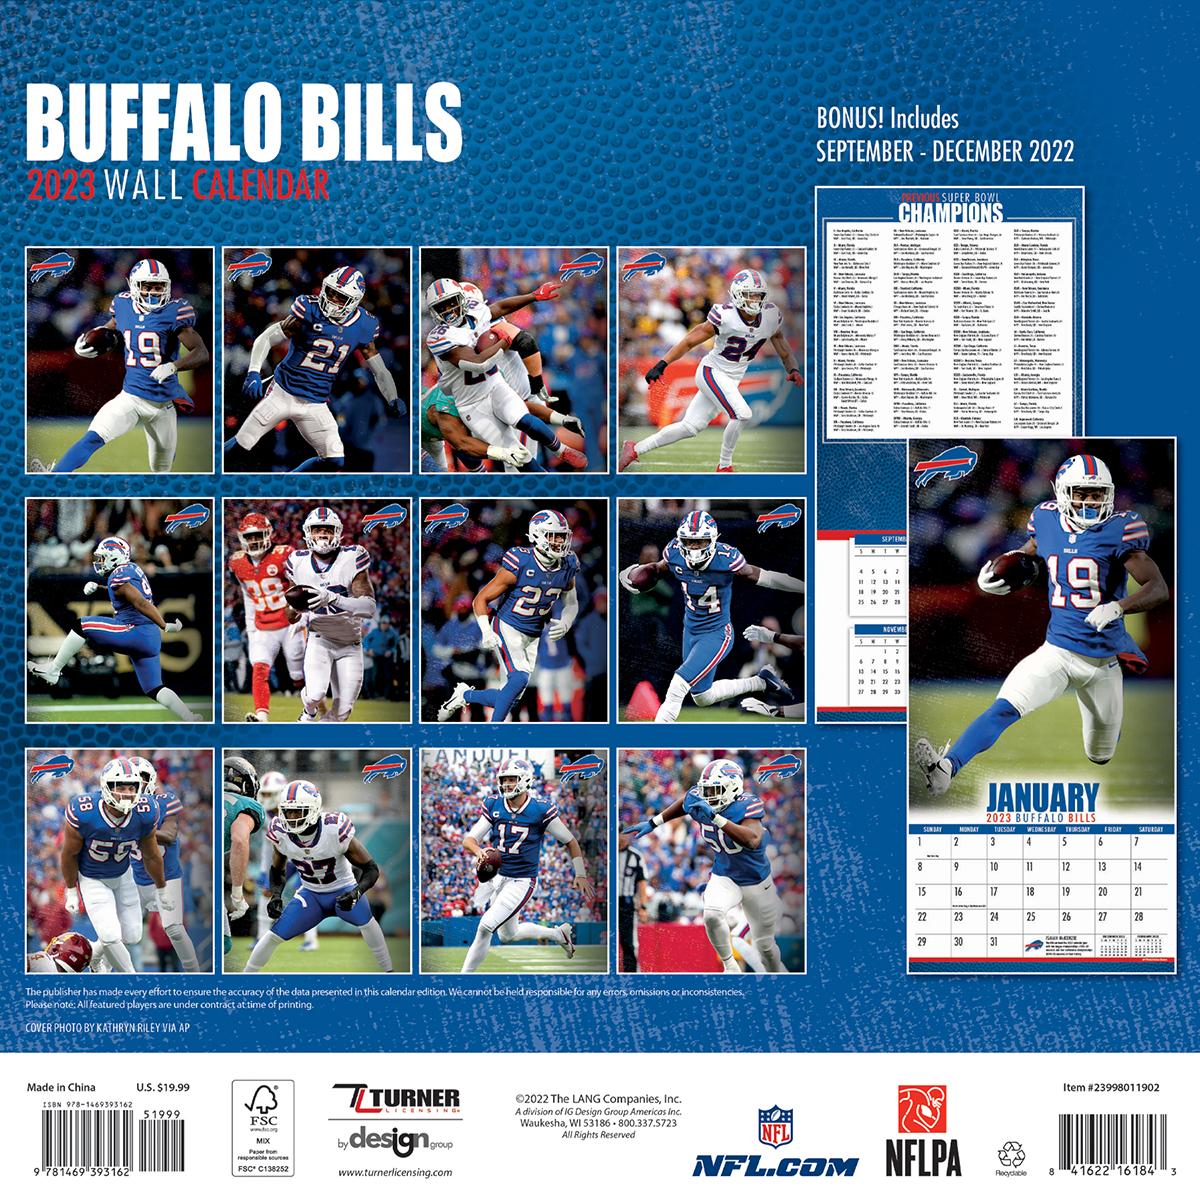 Buffalo Bills 2019 Nfl Wall Calendar Buy At Khc Sports